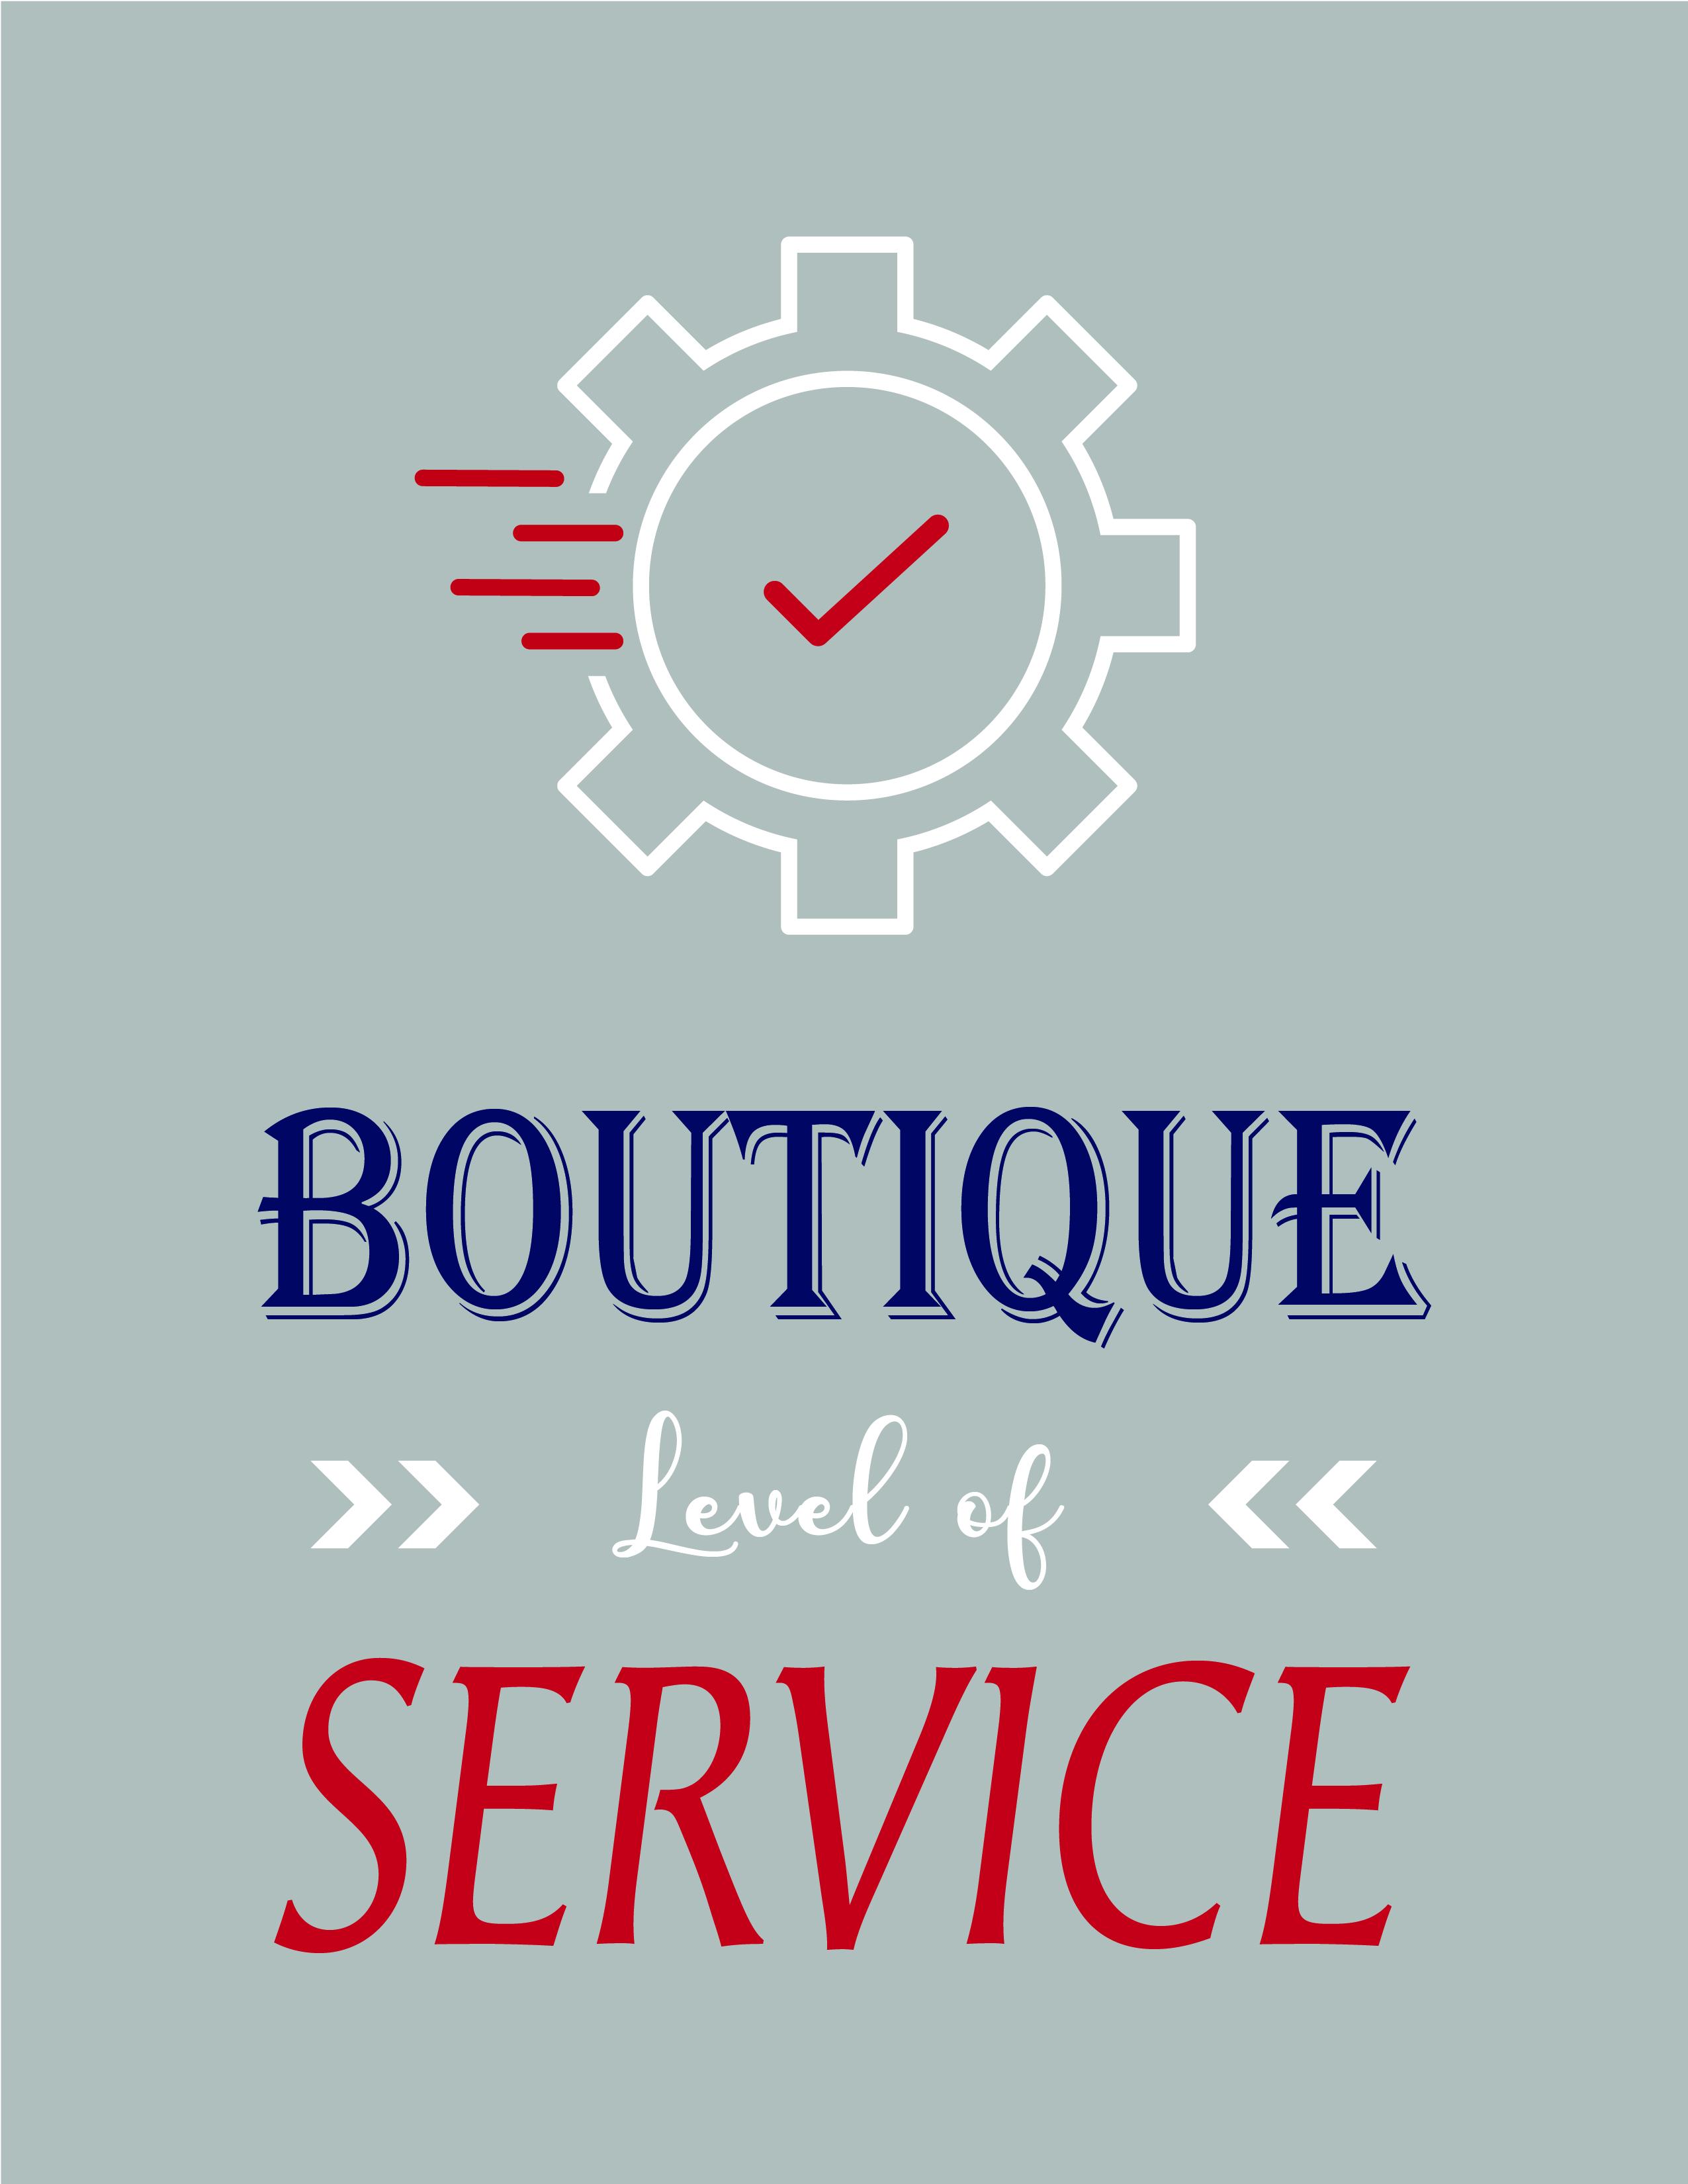 Boutique Level of Service